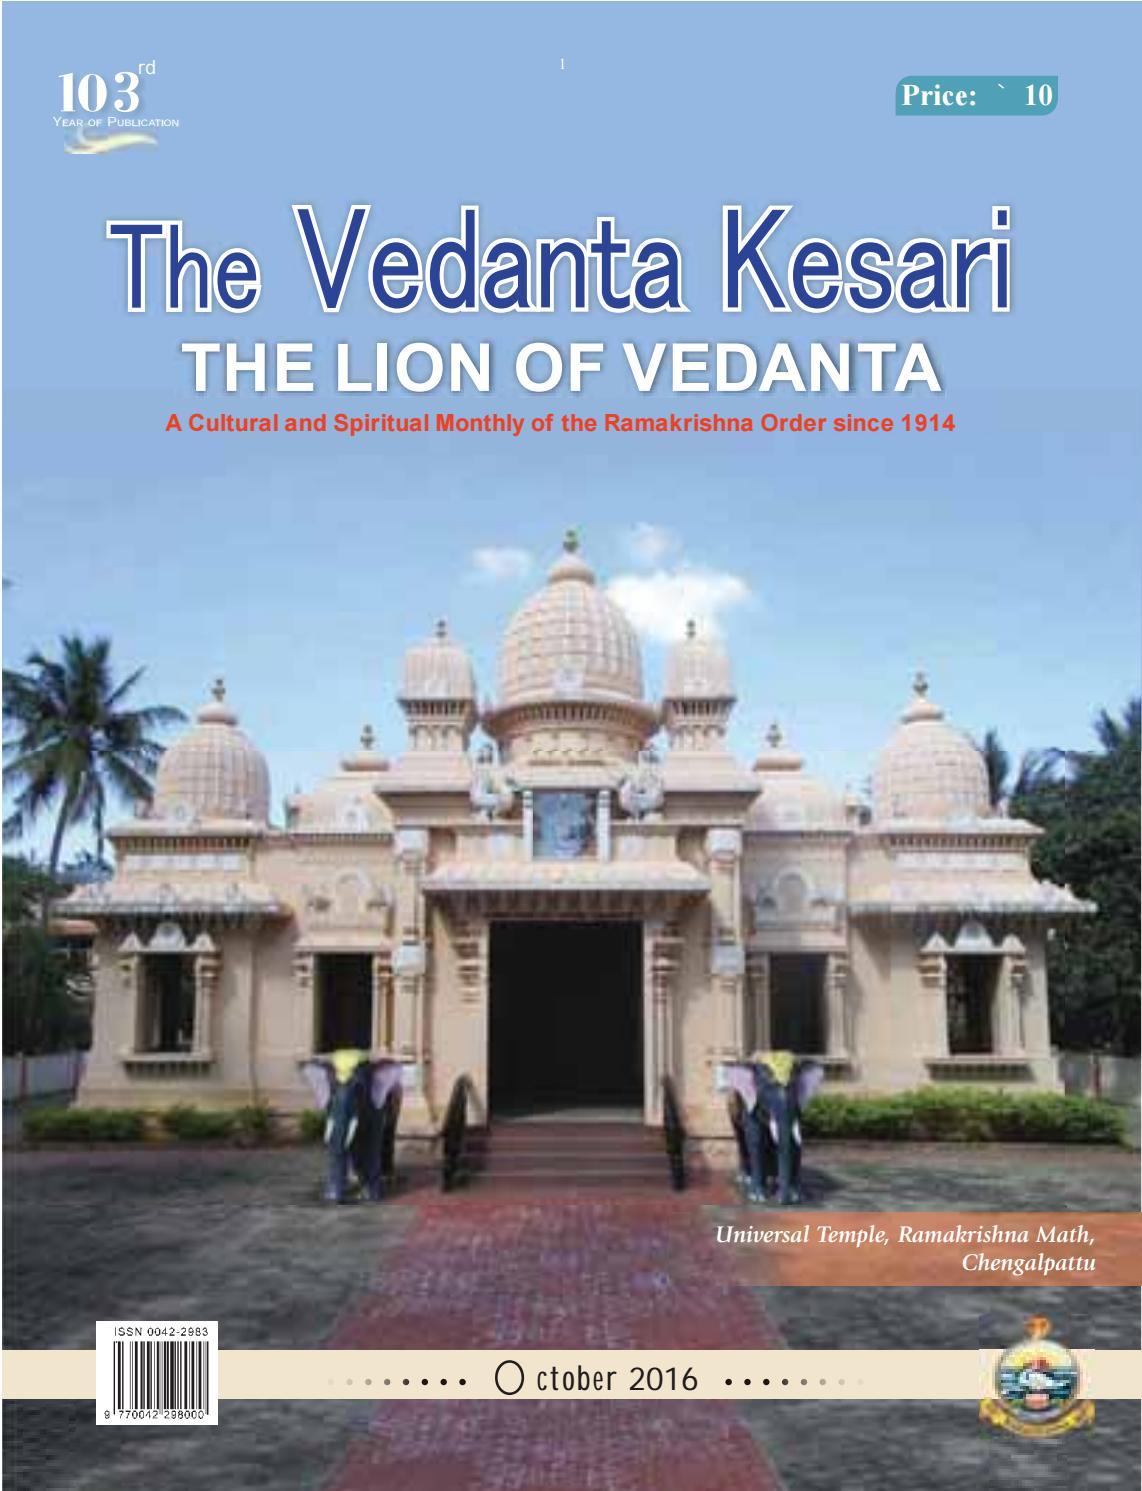 The vedanta kesari october 2016 issue by sri ramakrishna math the vedanta kesari october 2016 issue by sri ramakrishna math chennai issuu aiddatafo Gallery